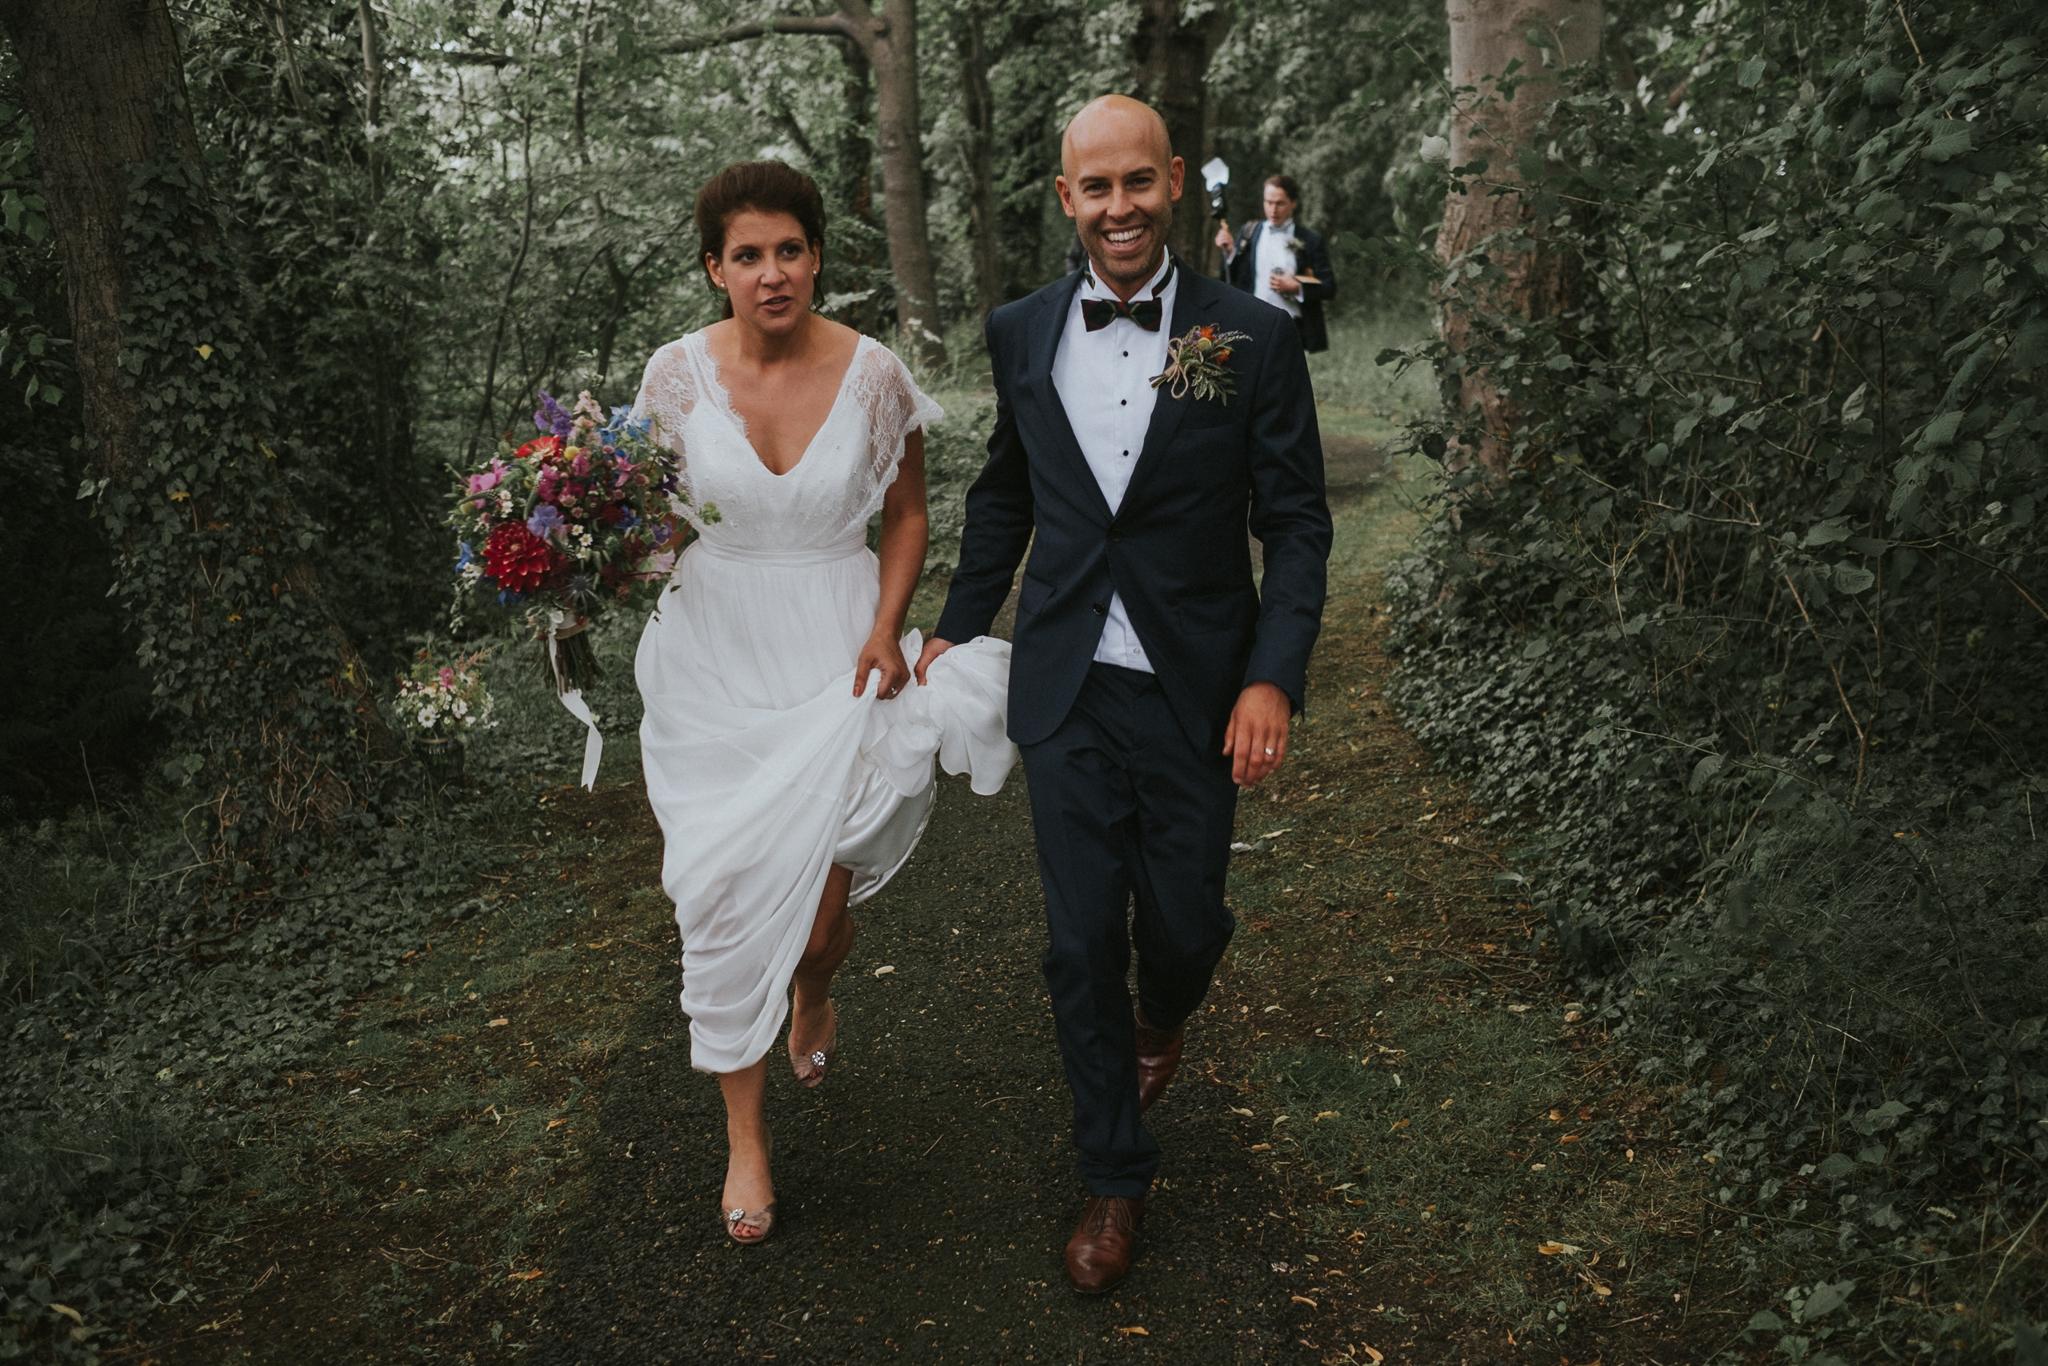 CRAIG-NICHOLAS-BERKSHIRE-WEDDING-PHOTOGRAHY (20 of 26).jpg